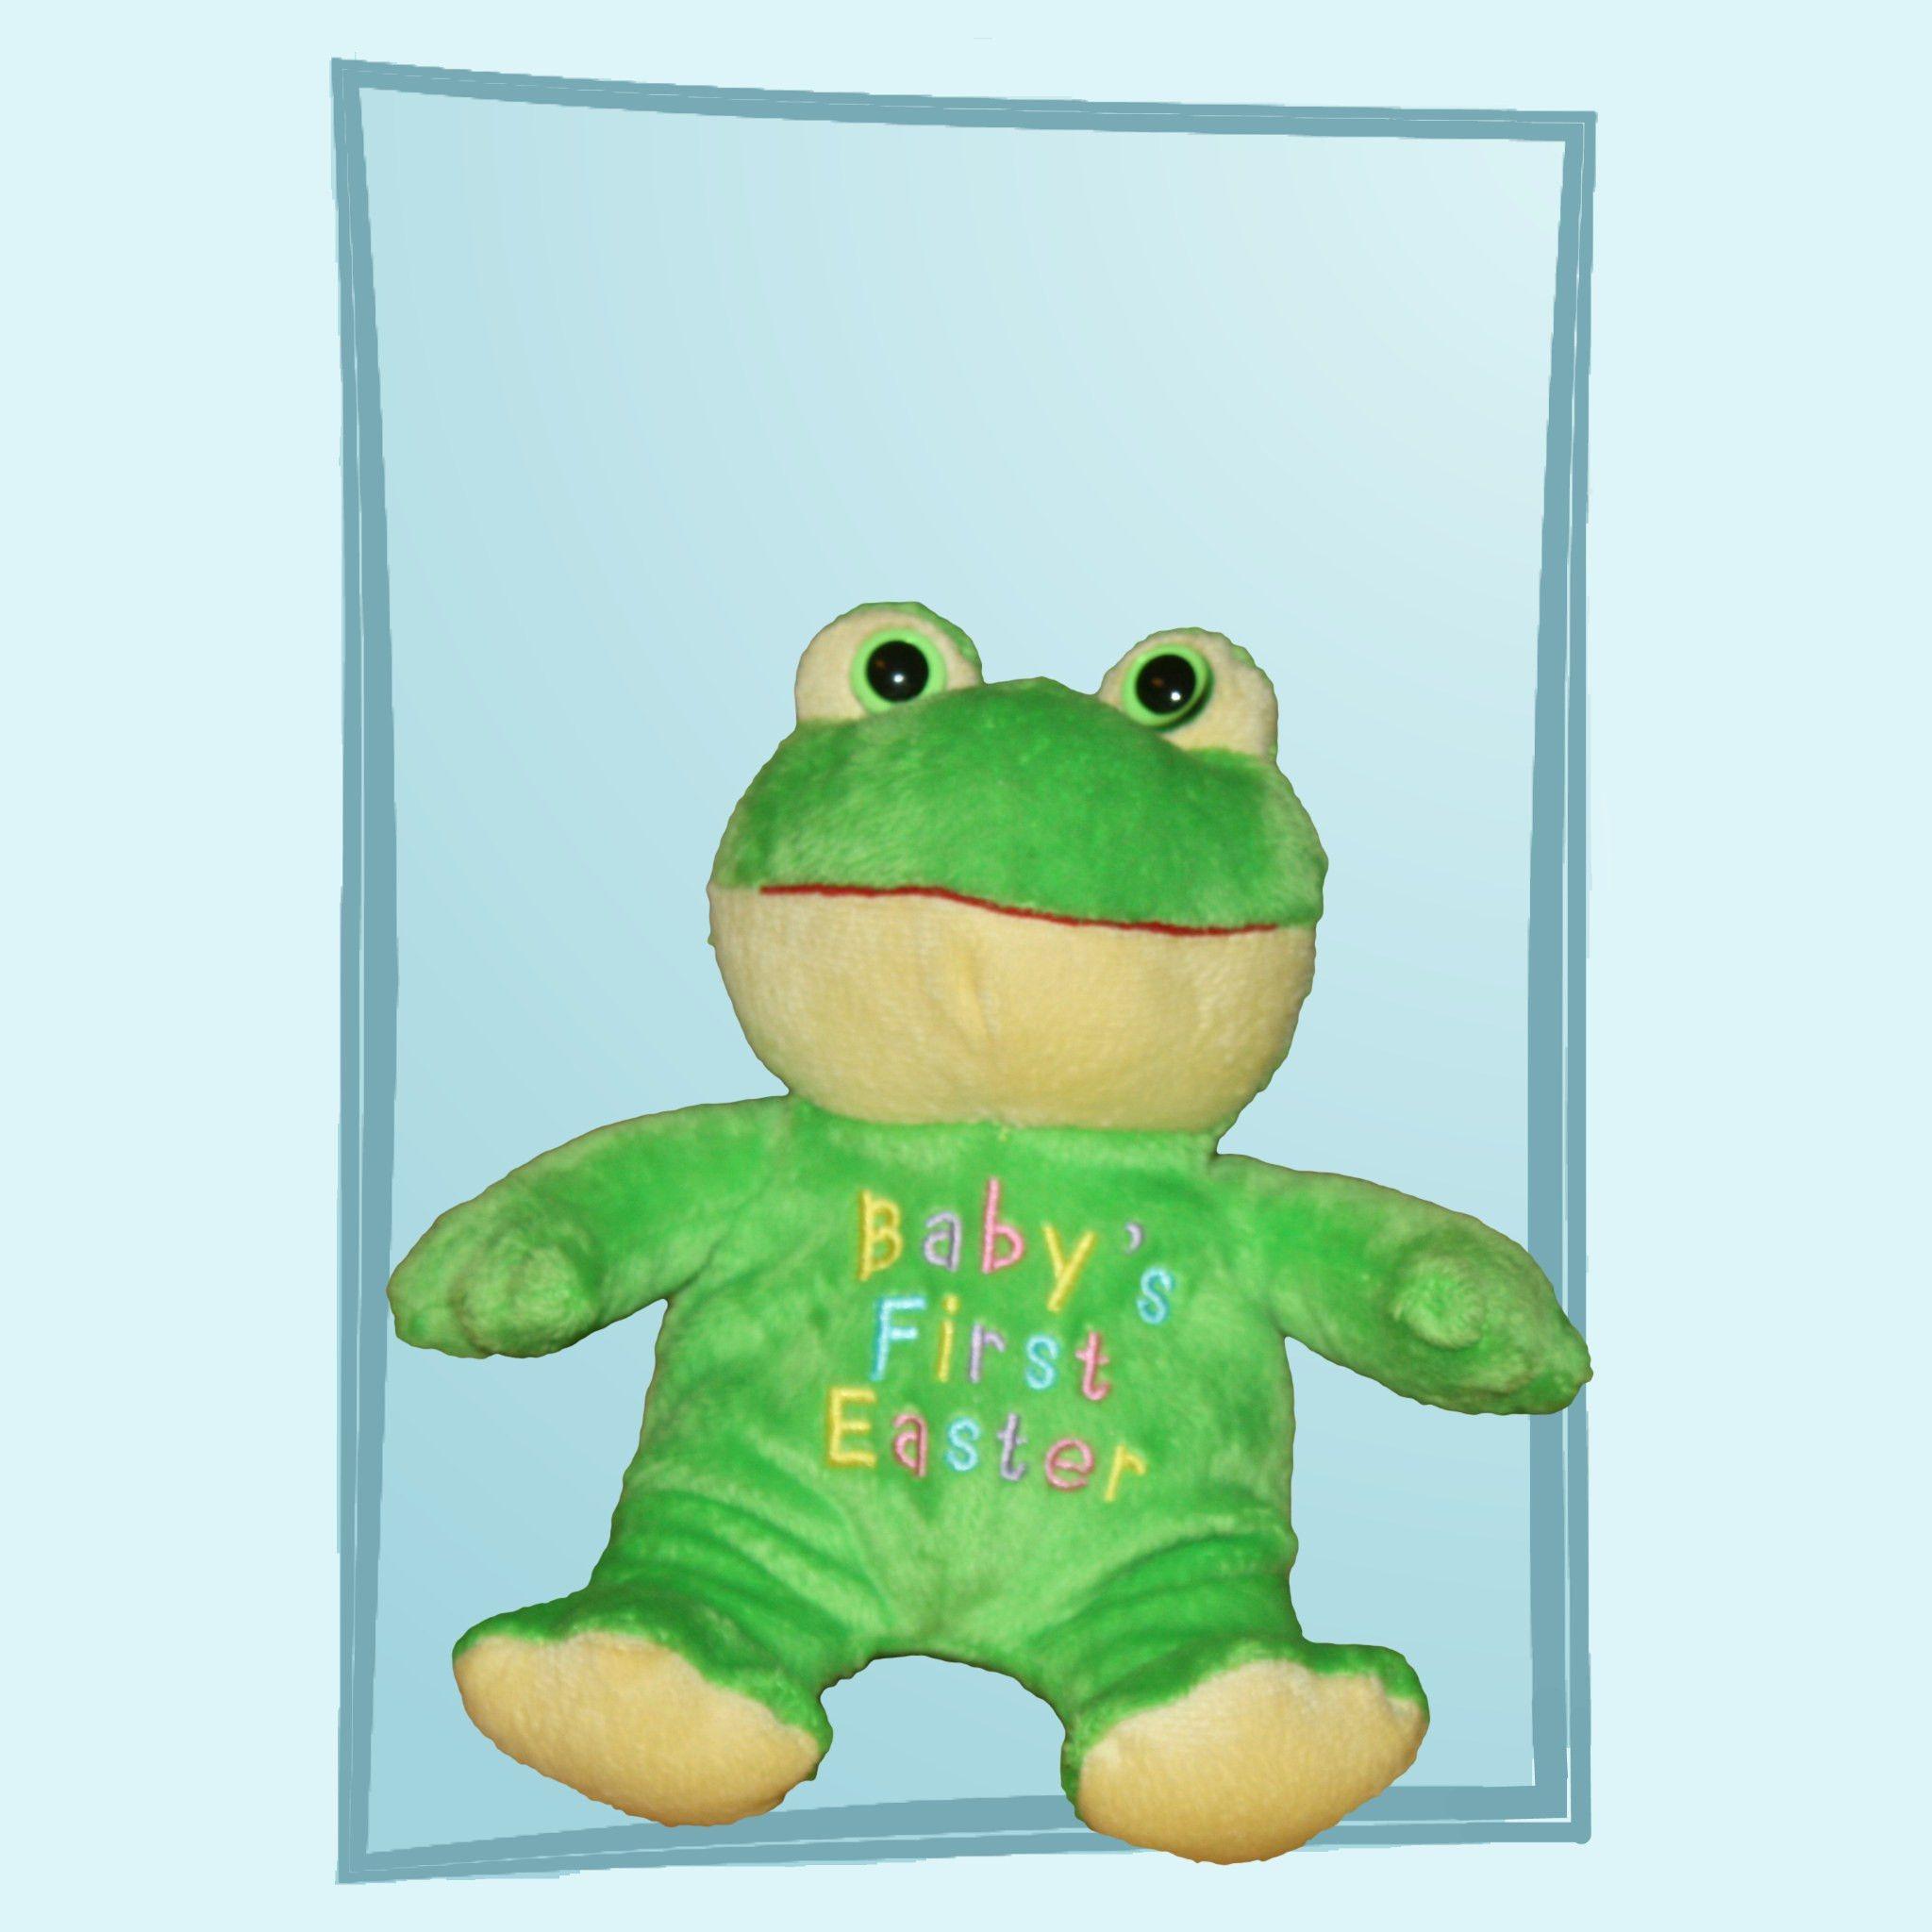 Predownload: Walmart Baby S First Easter Green Frog Walmart Baby Green Frog Plush Toy [ 2048 x 2048 Pixel ]